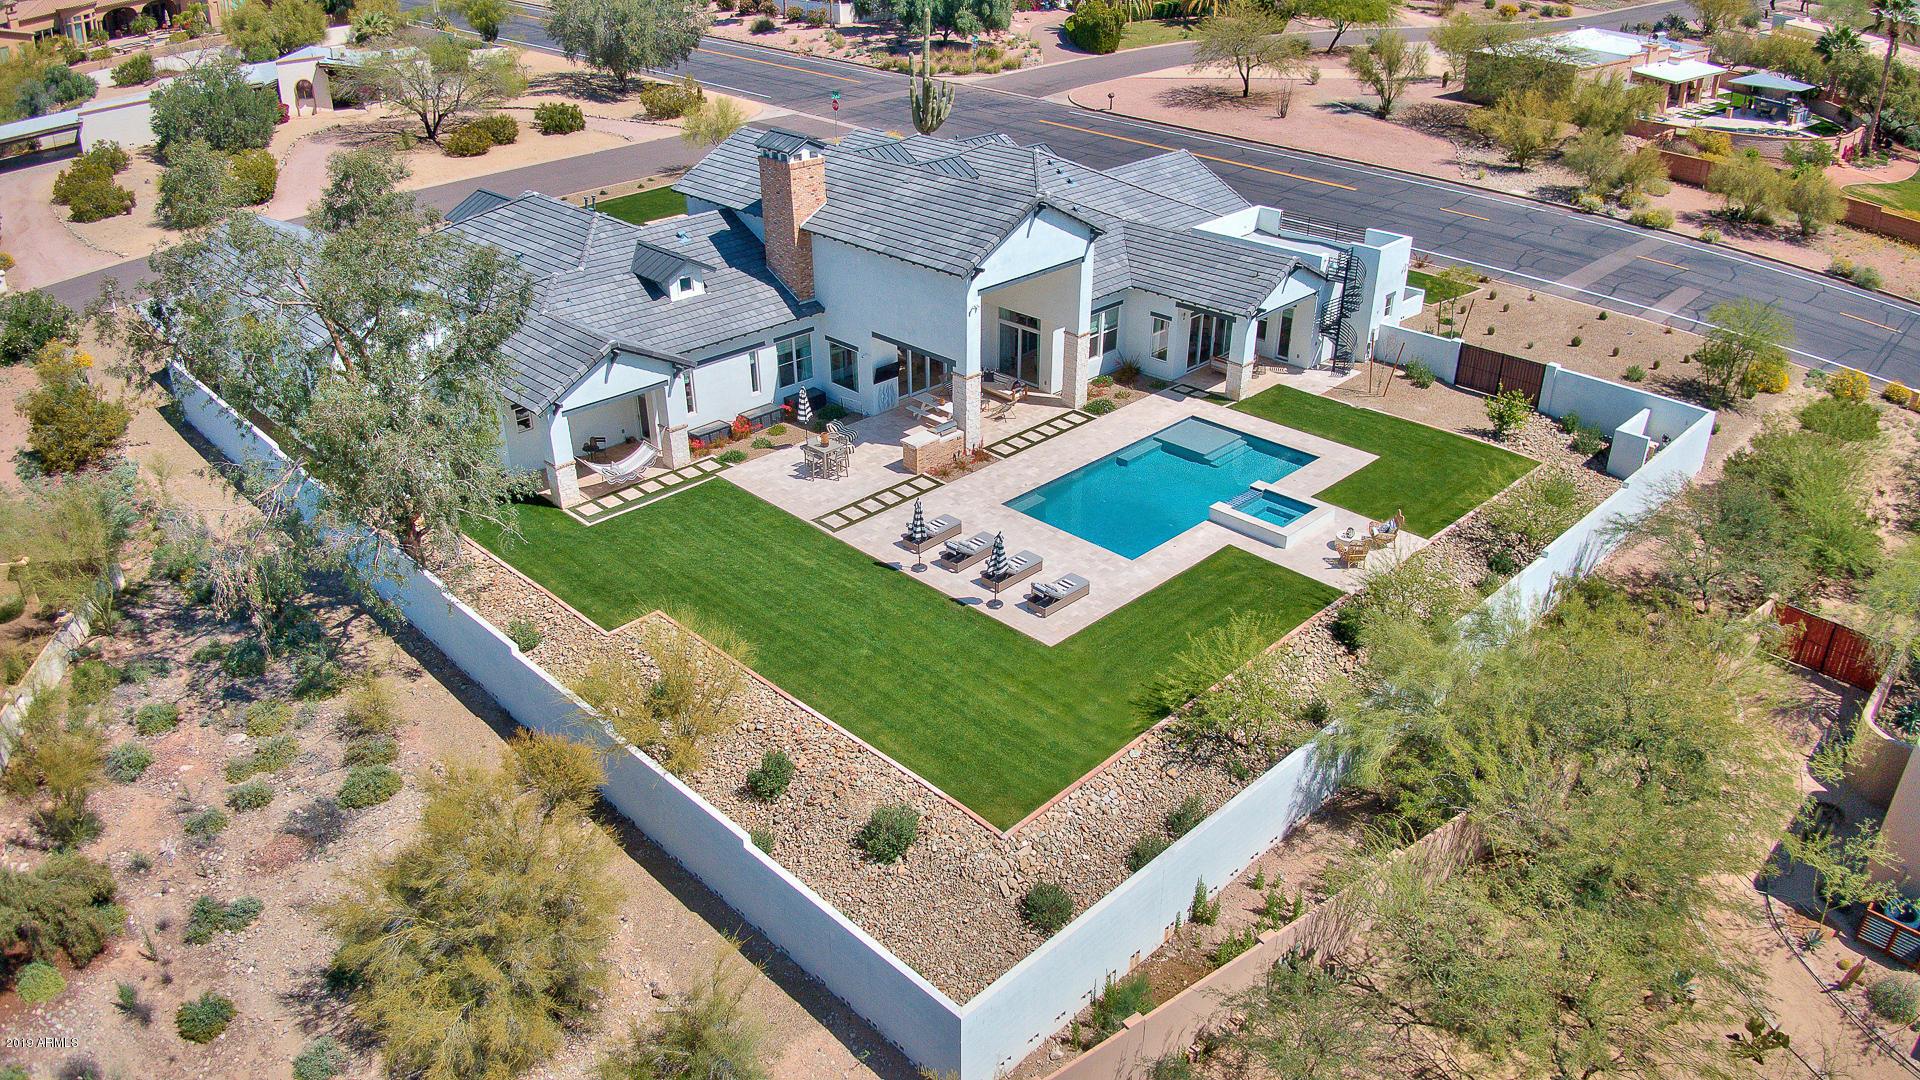 MLS 5933051 10331 E Charter Oak Drive, Scottsdale, AZ 85260 Scottsdale AZ Private Pool